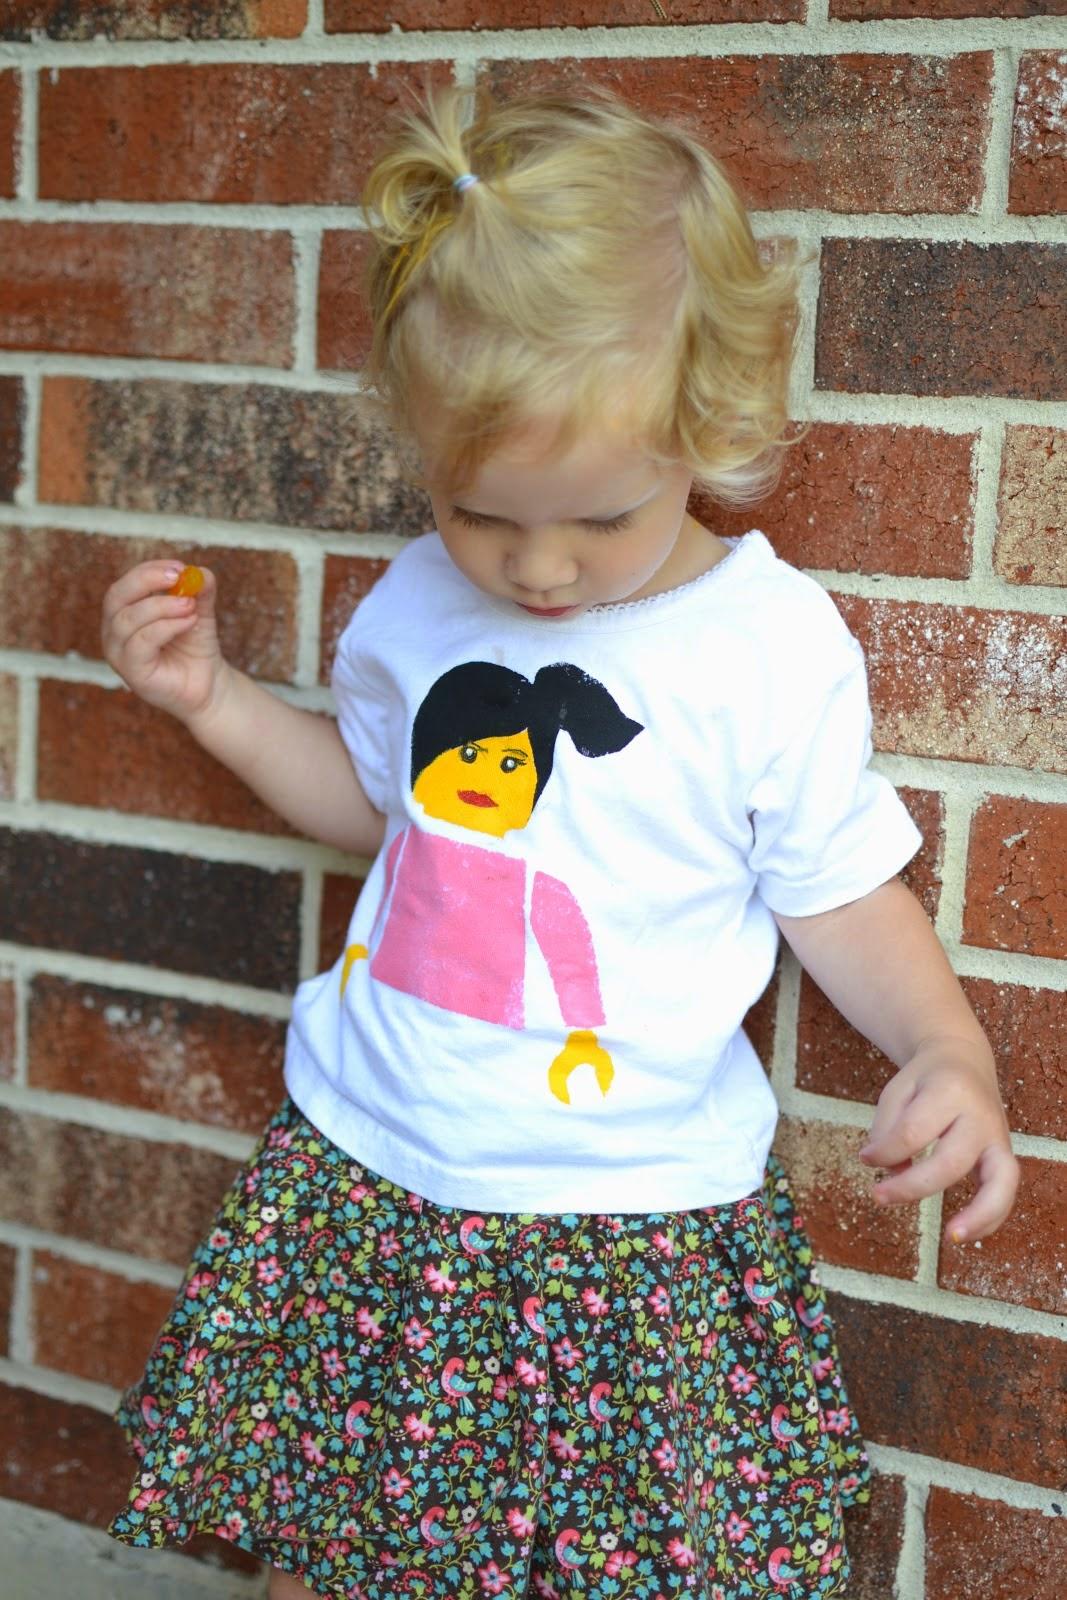 http://plentyofpaprika.blogspot.com/2014/08/diy-lego-figure-stencil-shirts.html